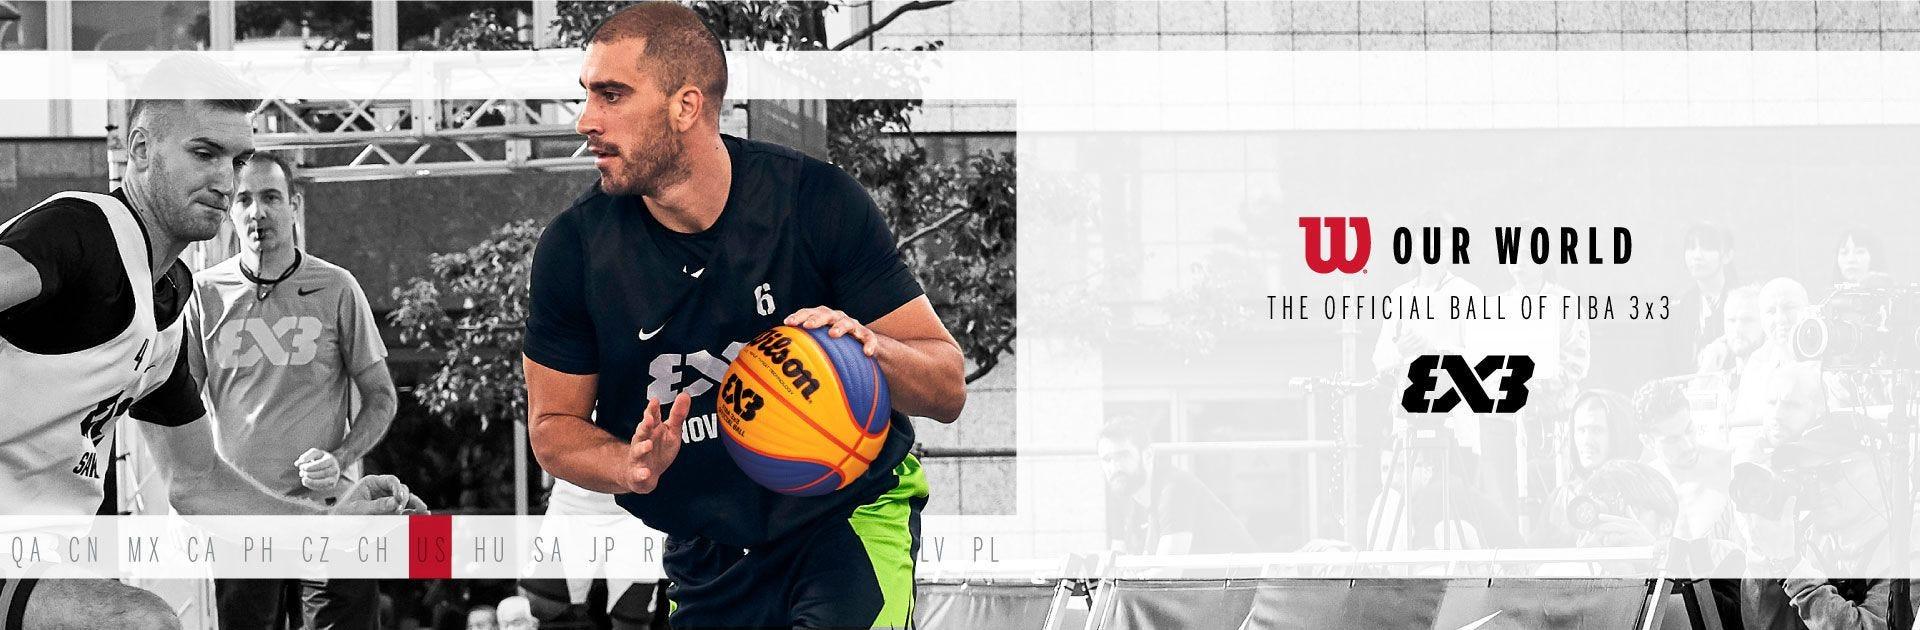 FIBA 3x3 player Dusan Bulut